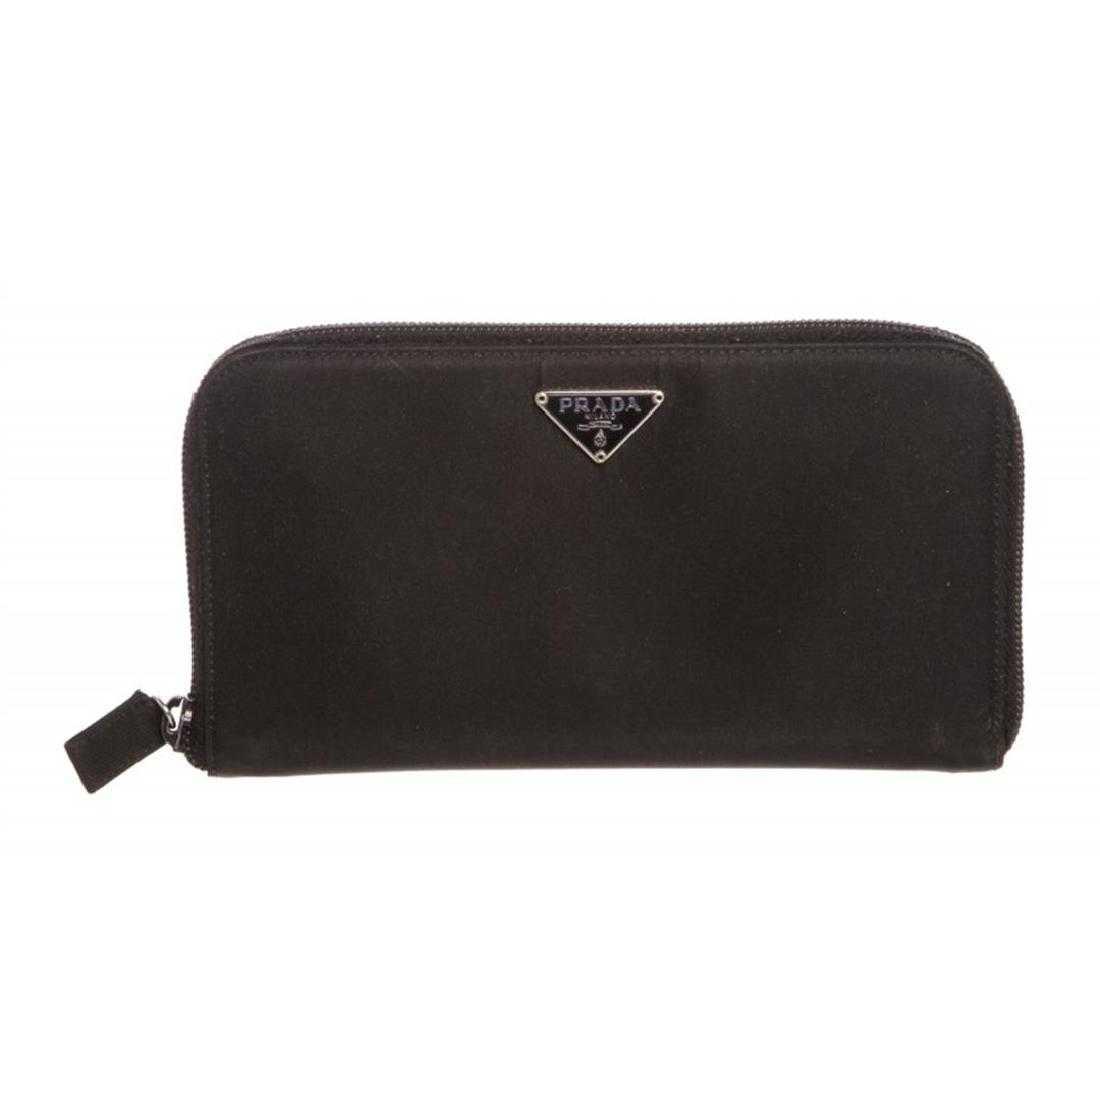 d217ebb4e8a Prada Black Nylon Leather Zipper Wallet